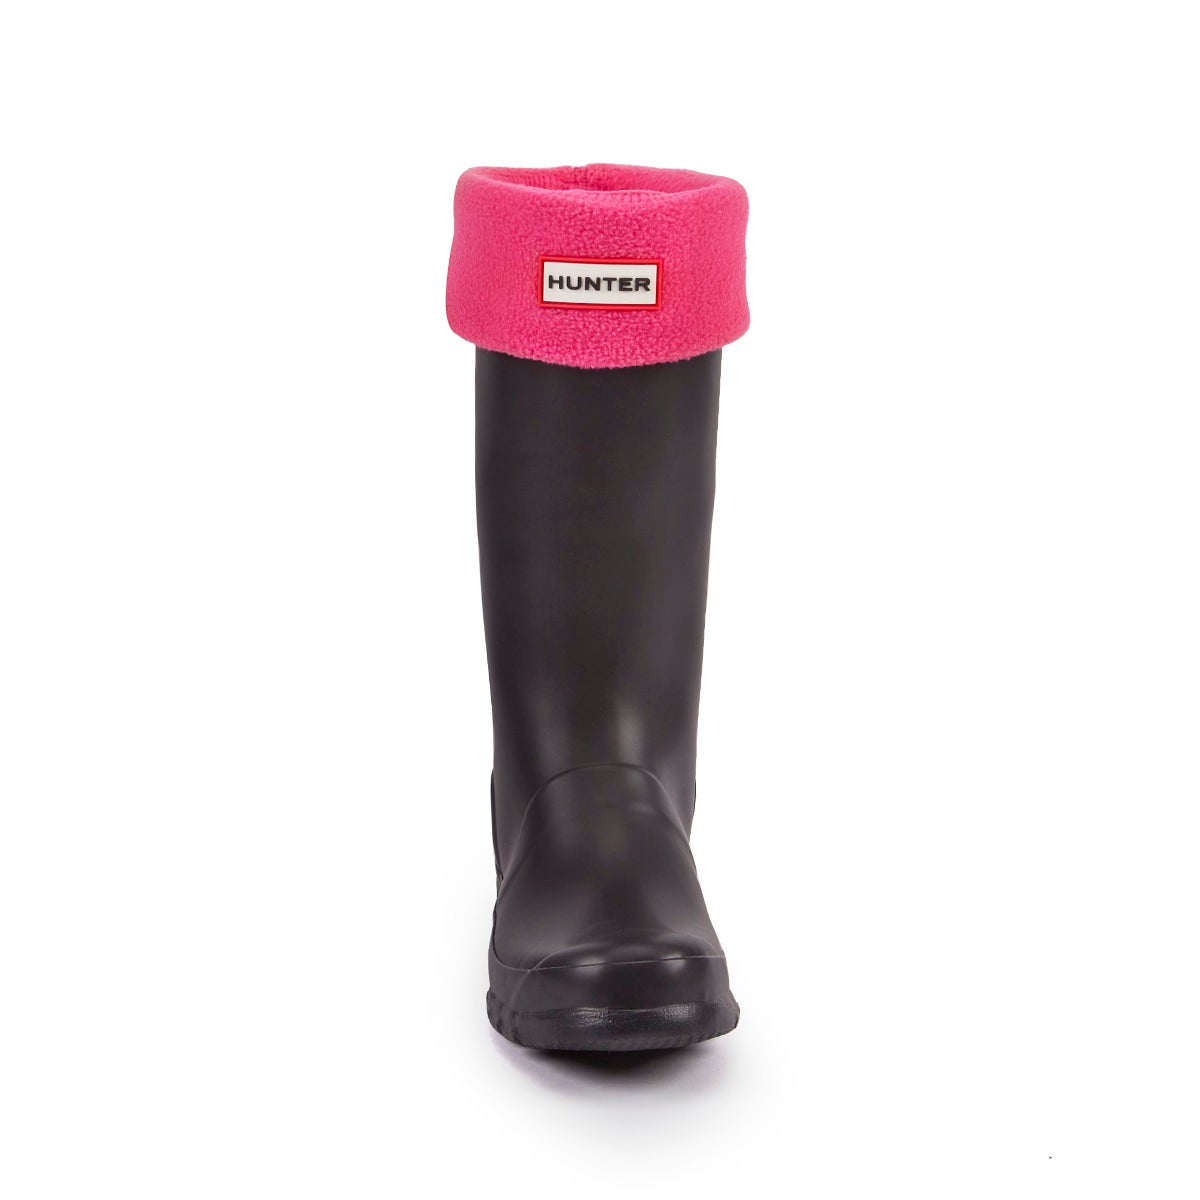 Chausson Boot Sock, fuchsia, enfants